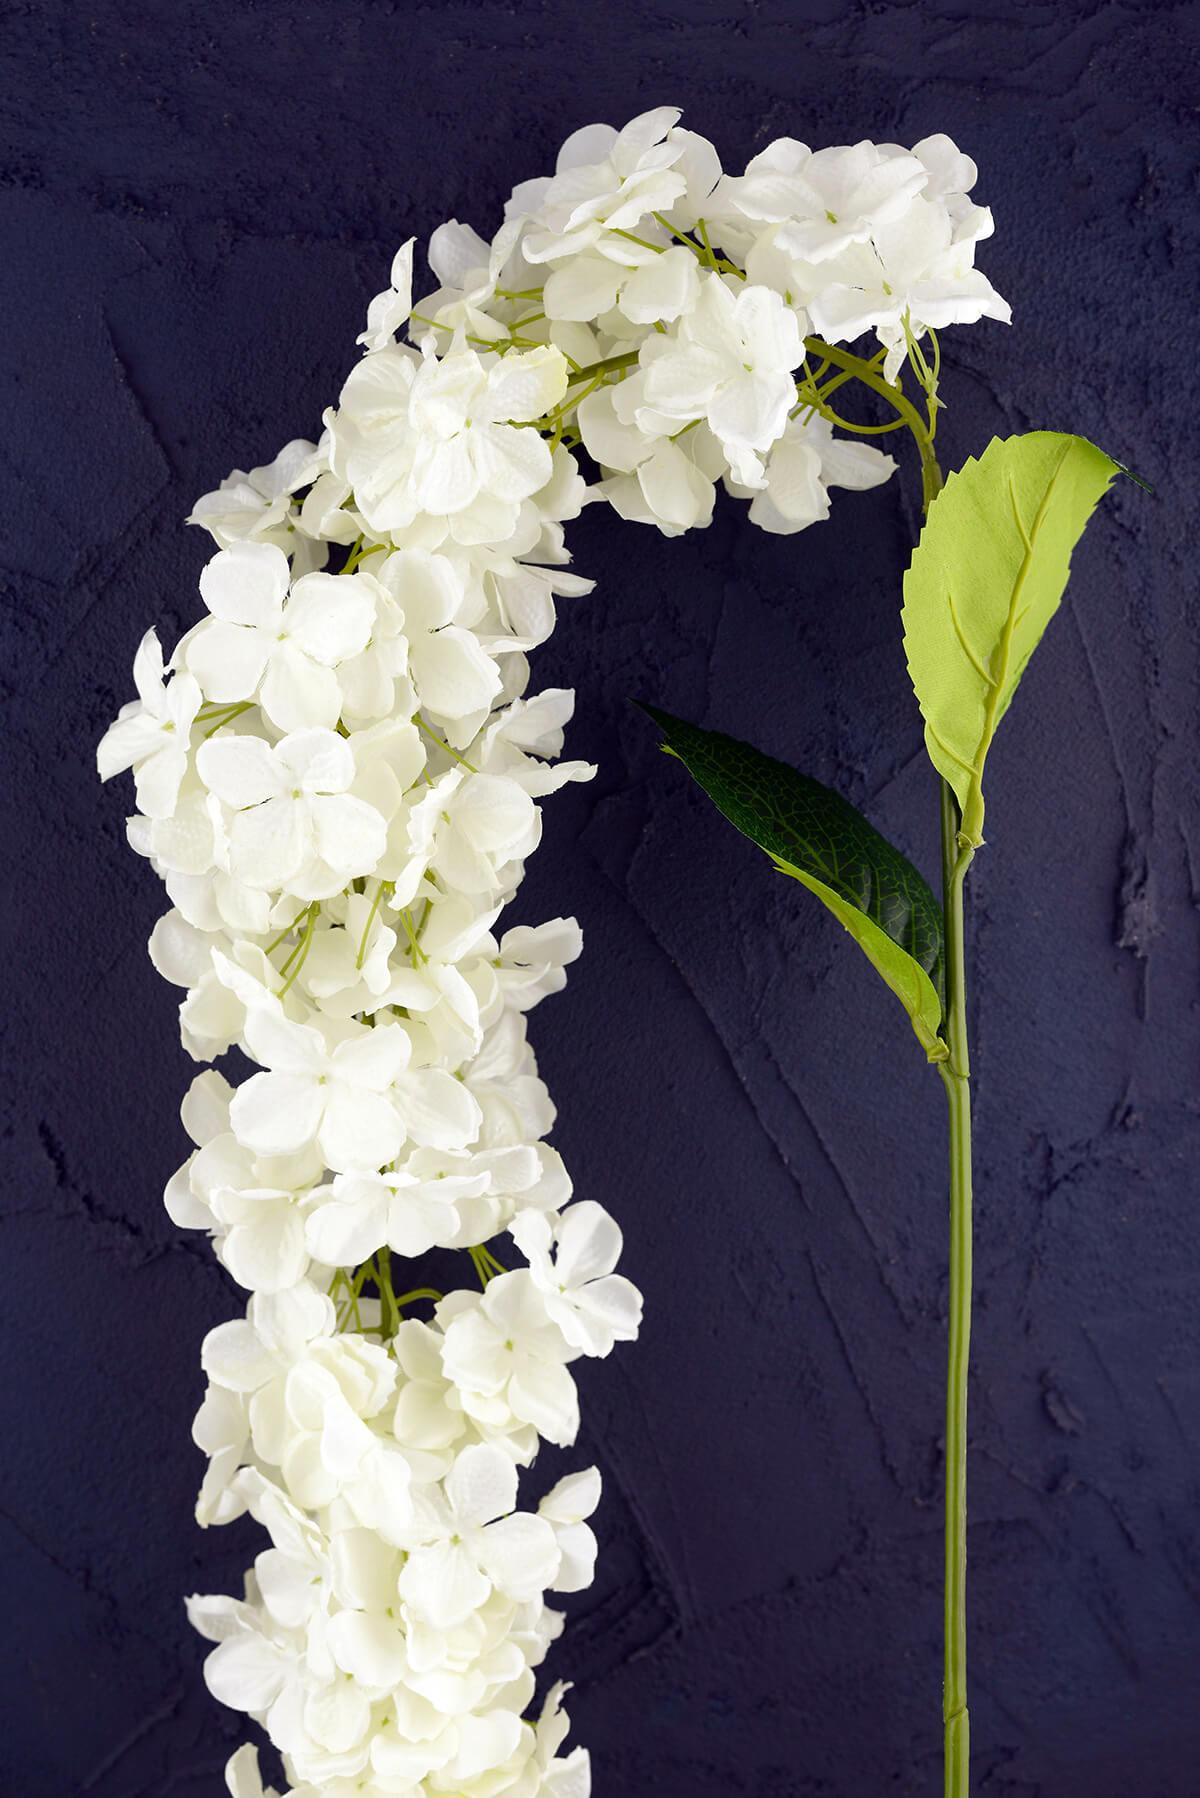 72 Quot Hanging Hydrangea Spray White